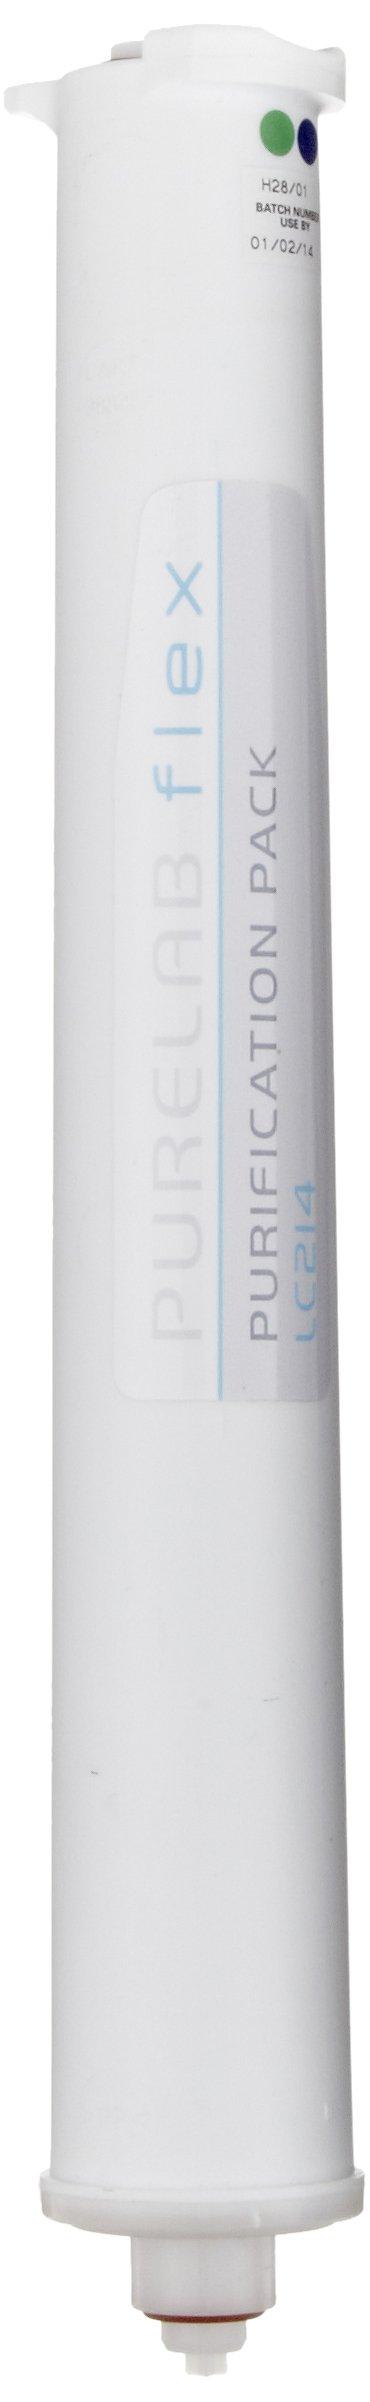 Elga LC214 Purification Cartridge, For Purelab Flex 3 and 4 by Elga